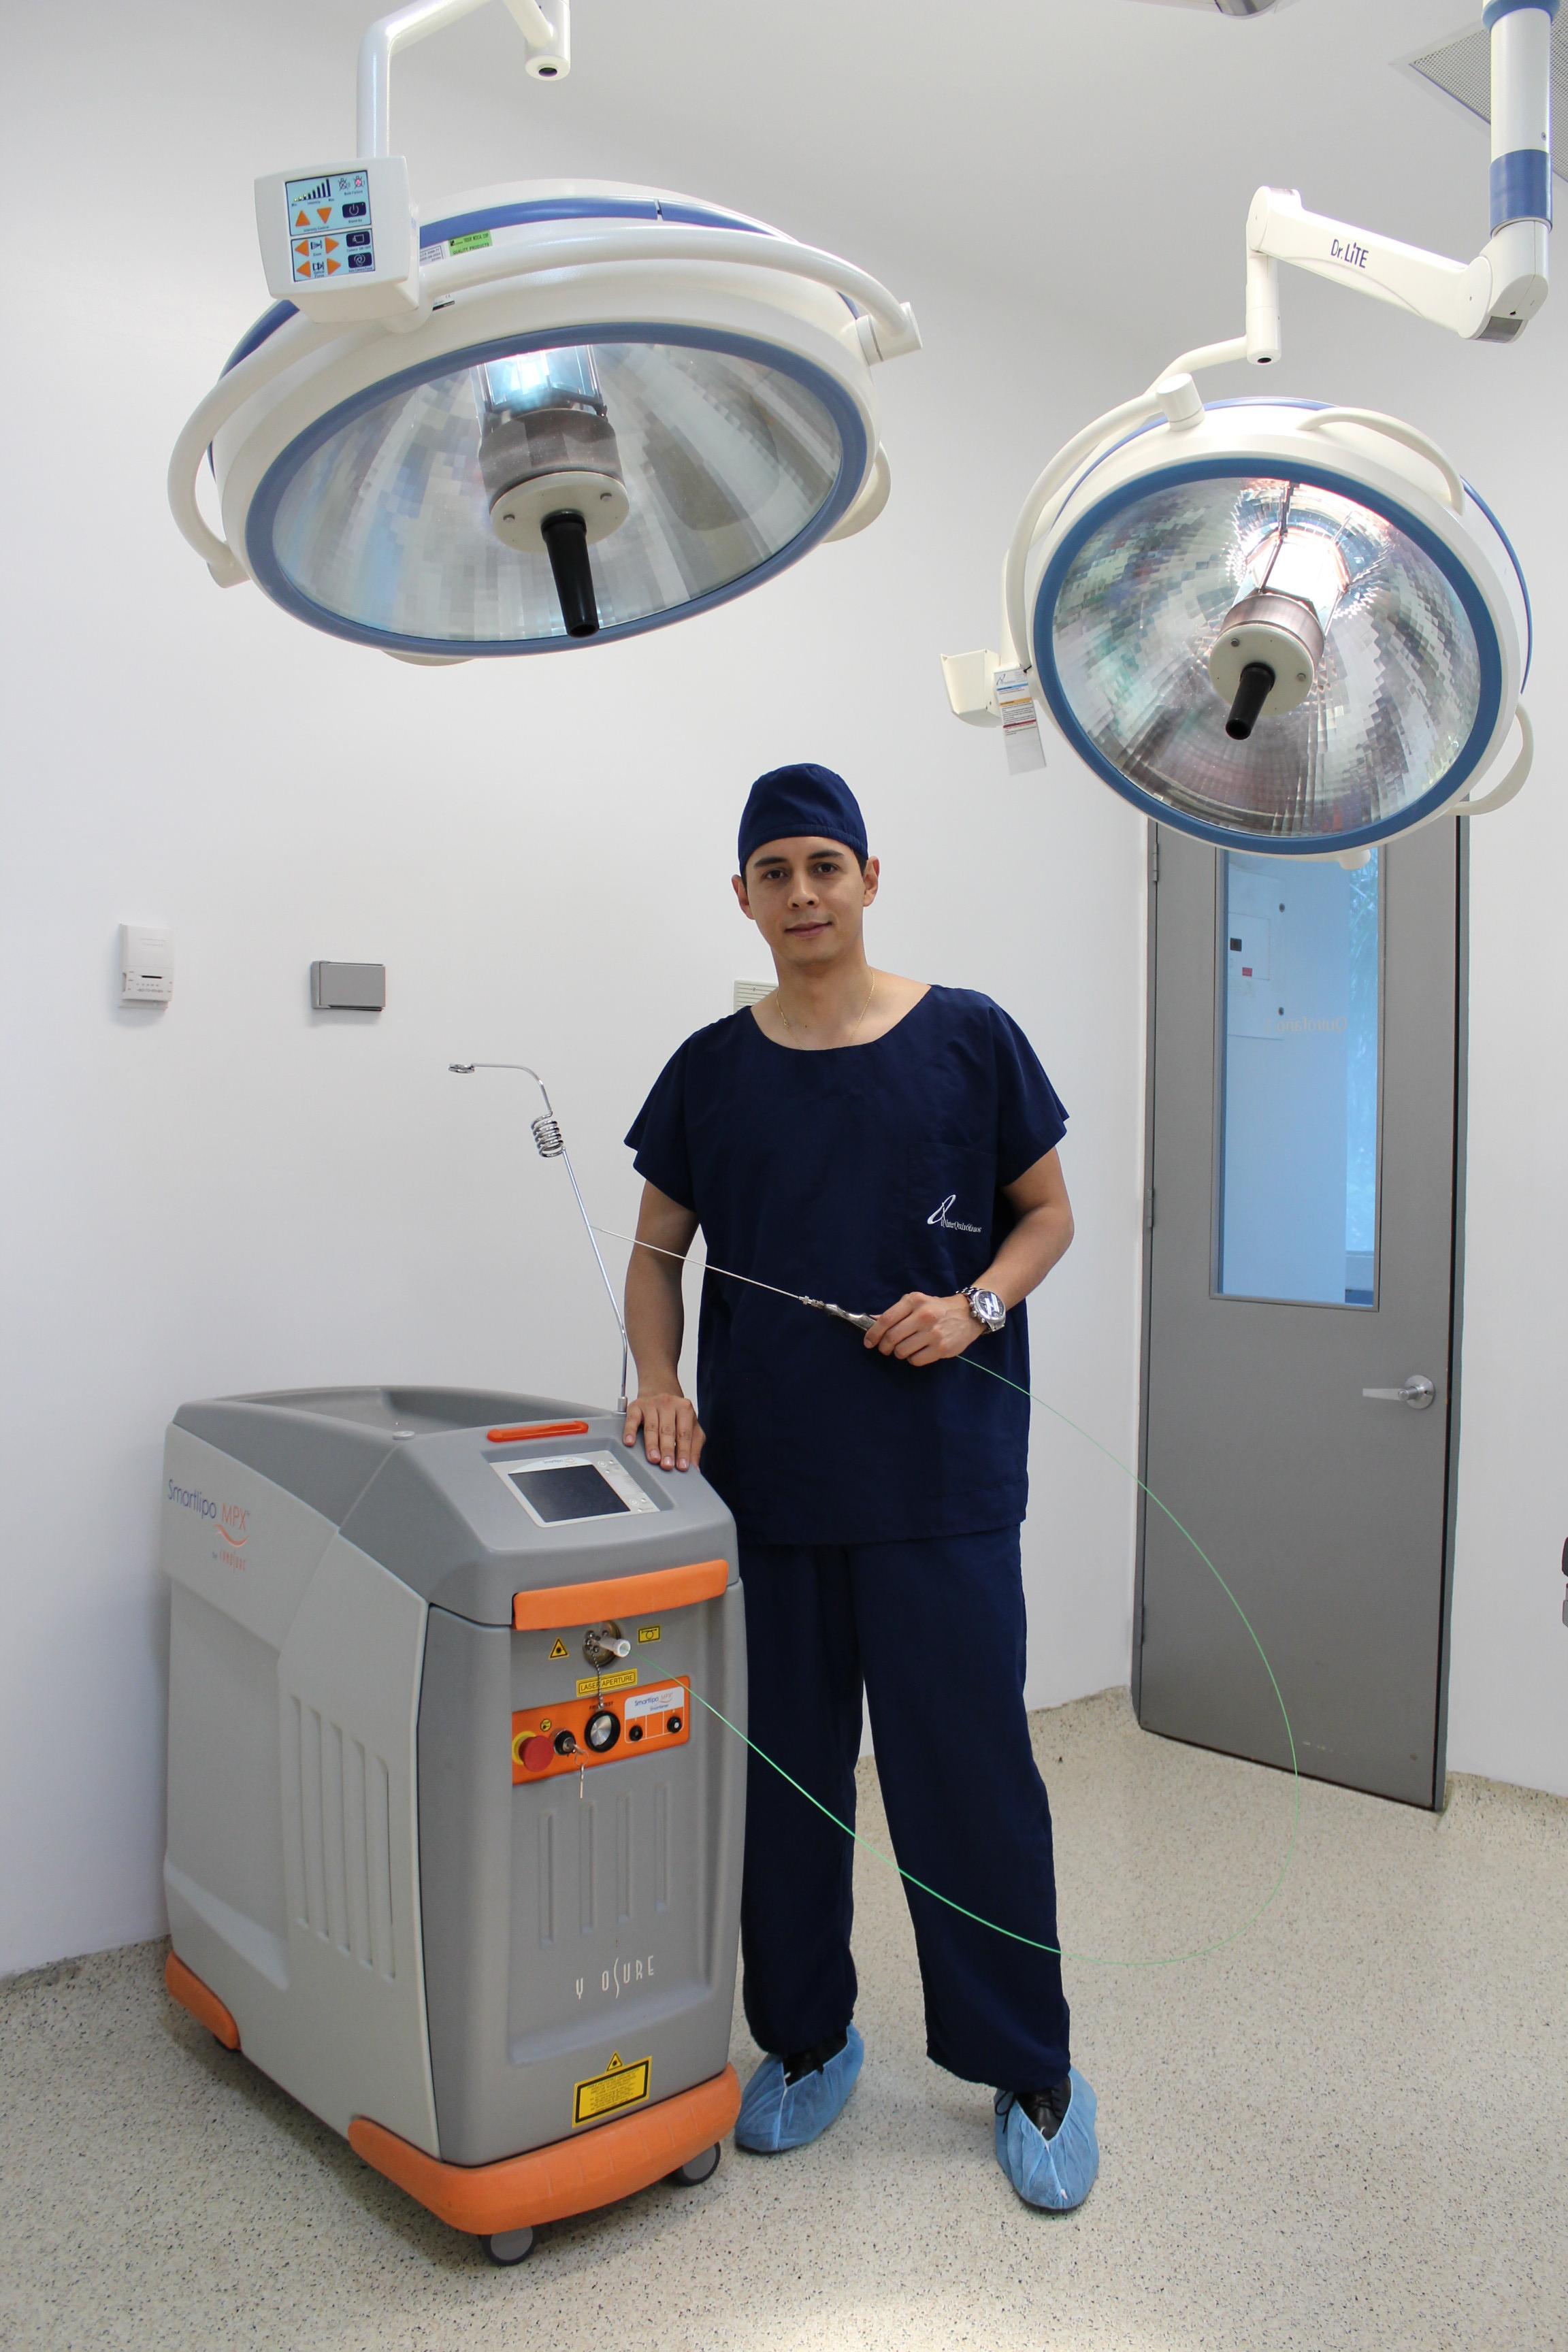 Liposuccion Laser Medellin Lipolisis Laser Medellin